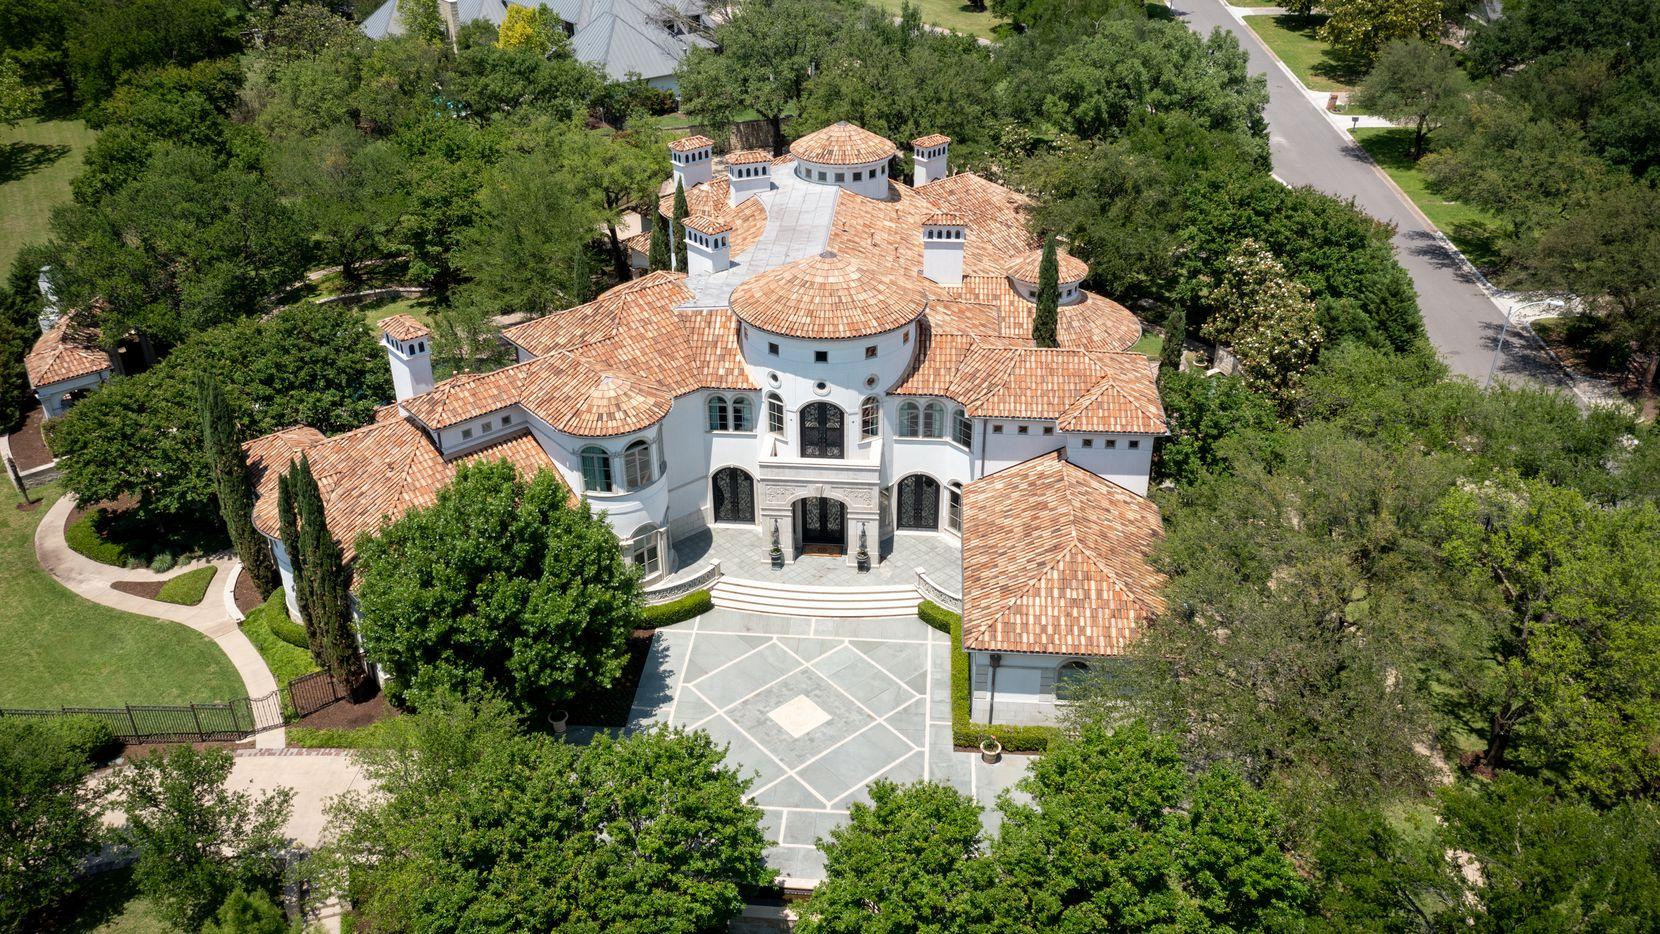 Take a look at the home at 5969 Westgrove Circle in Dallas.